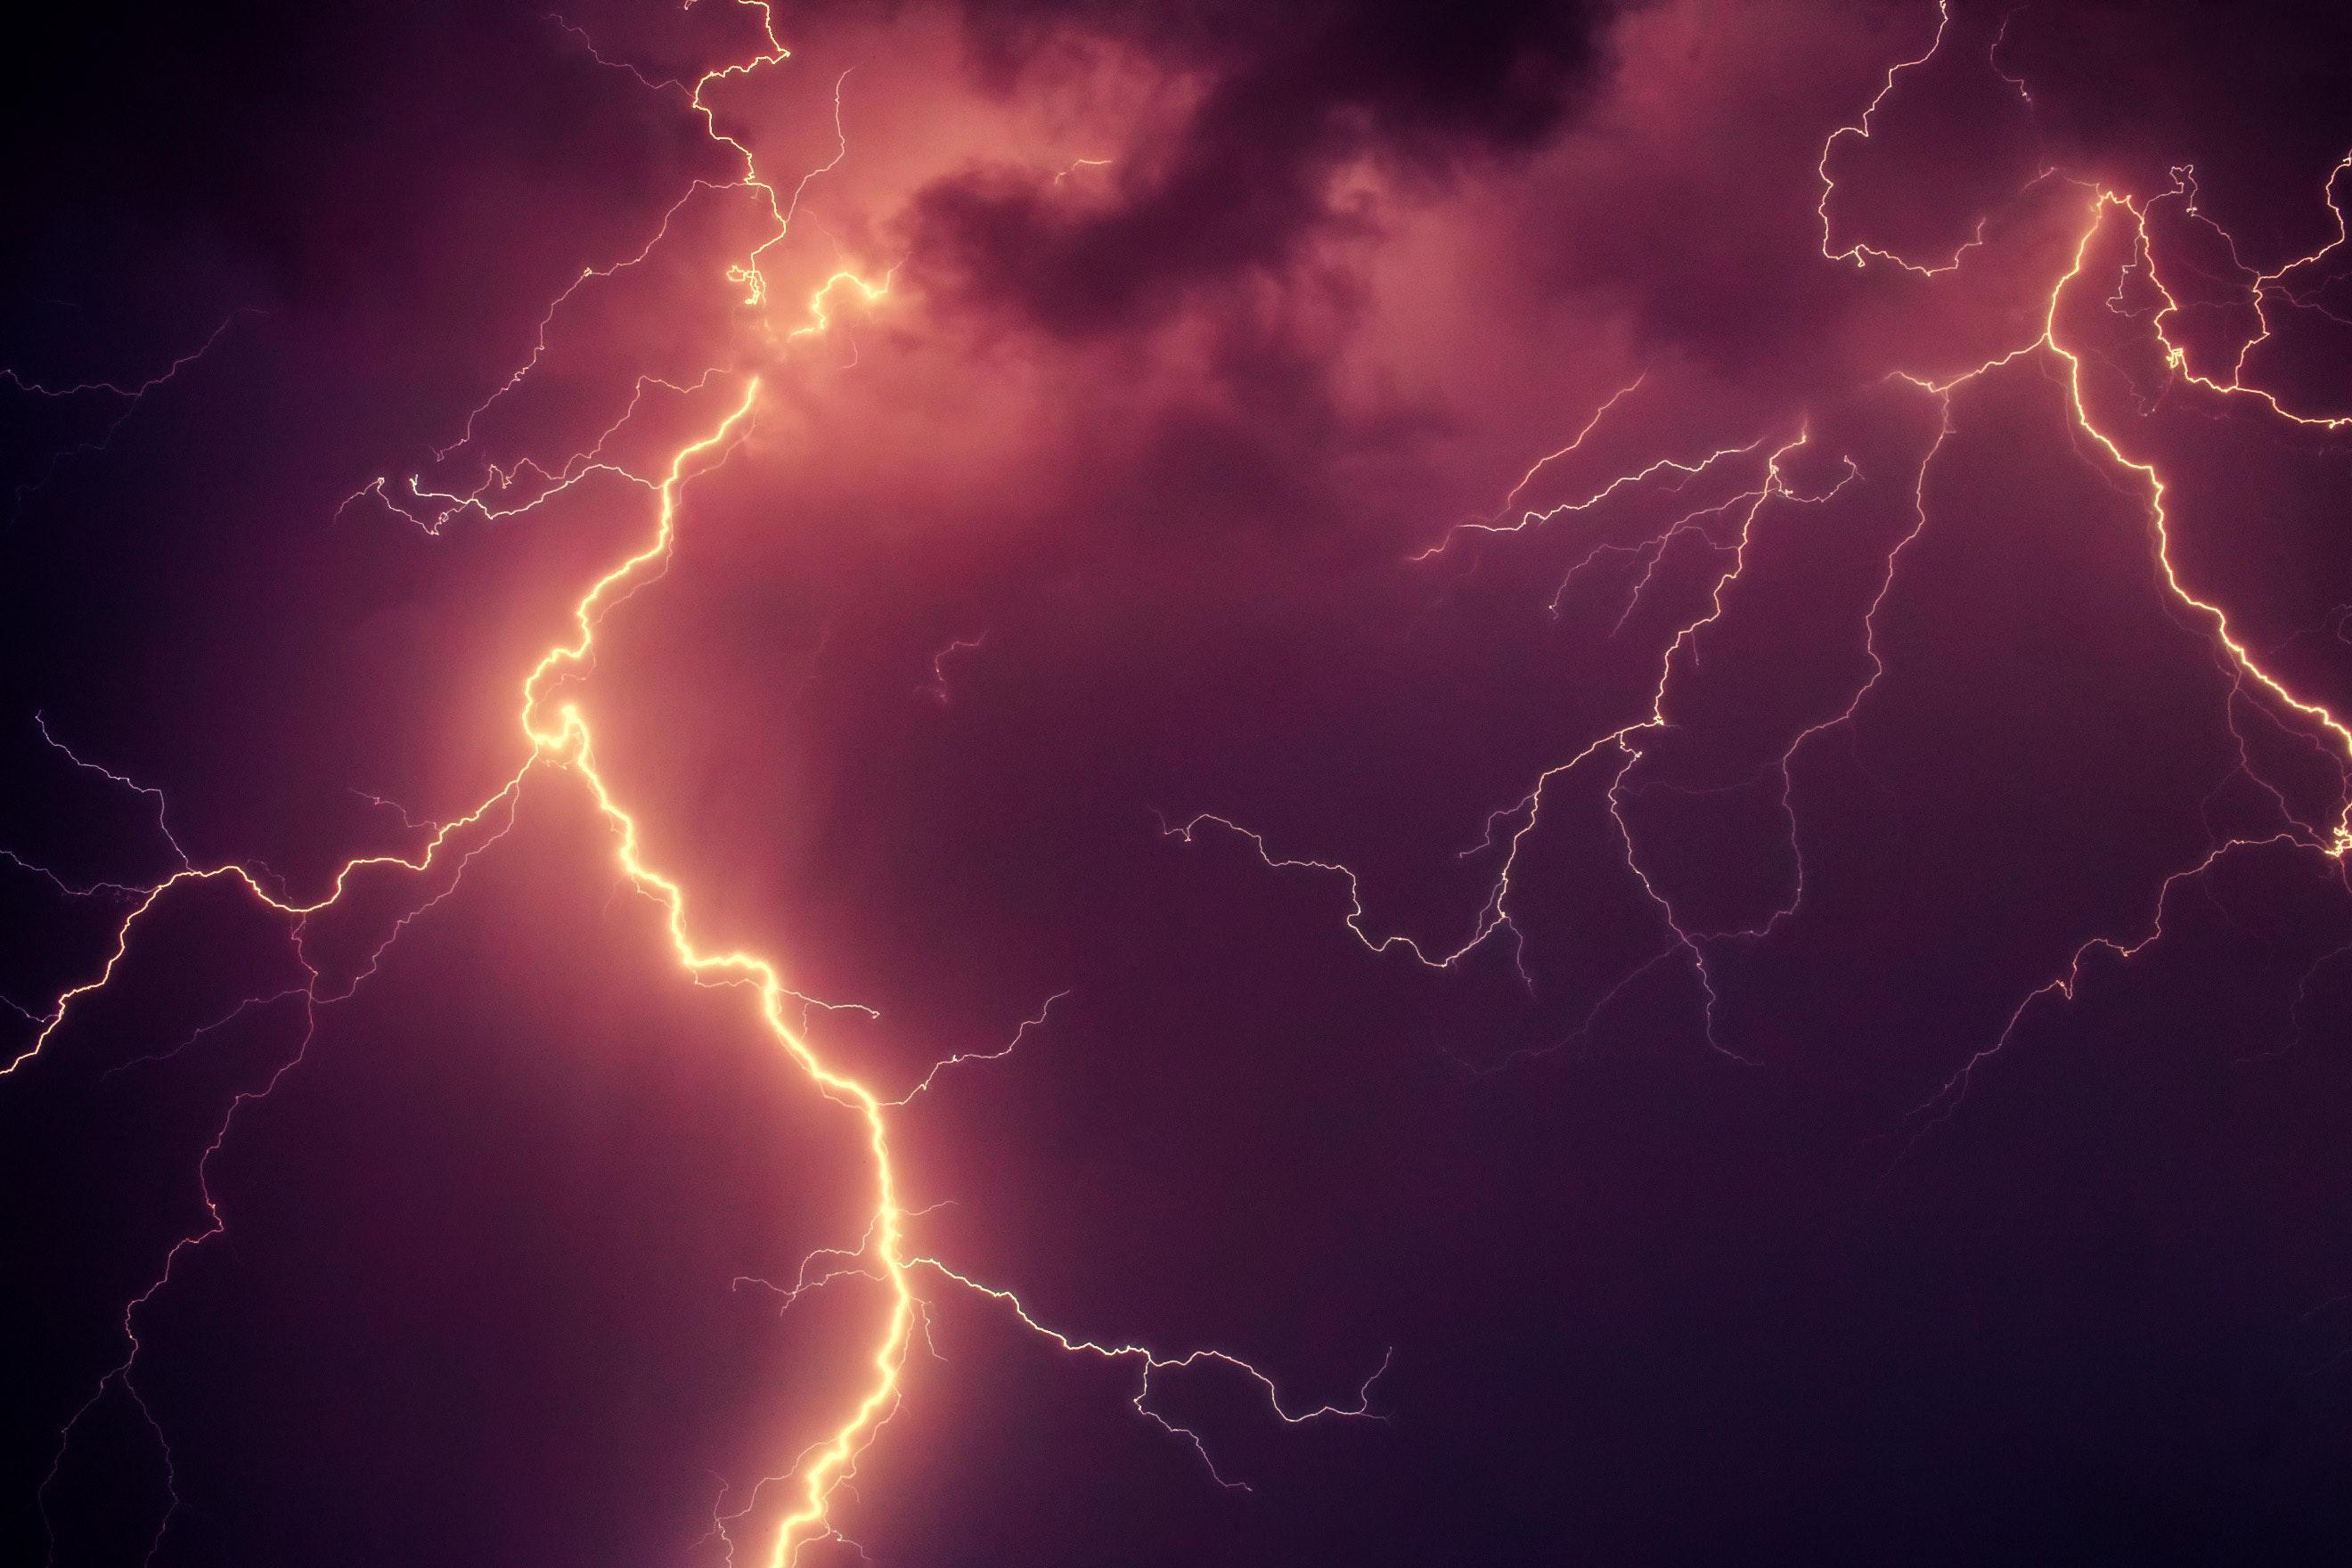 clouds-dark-lightning-1118869